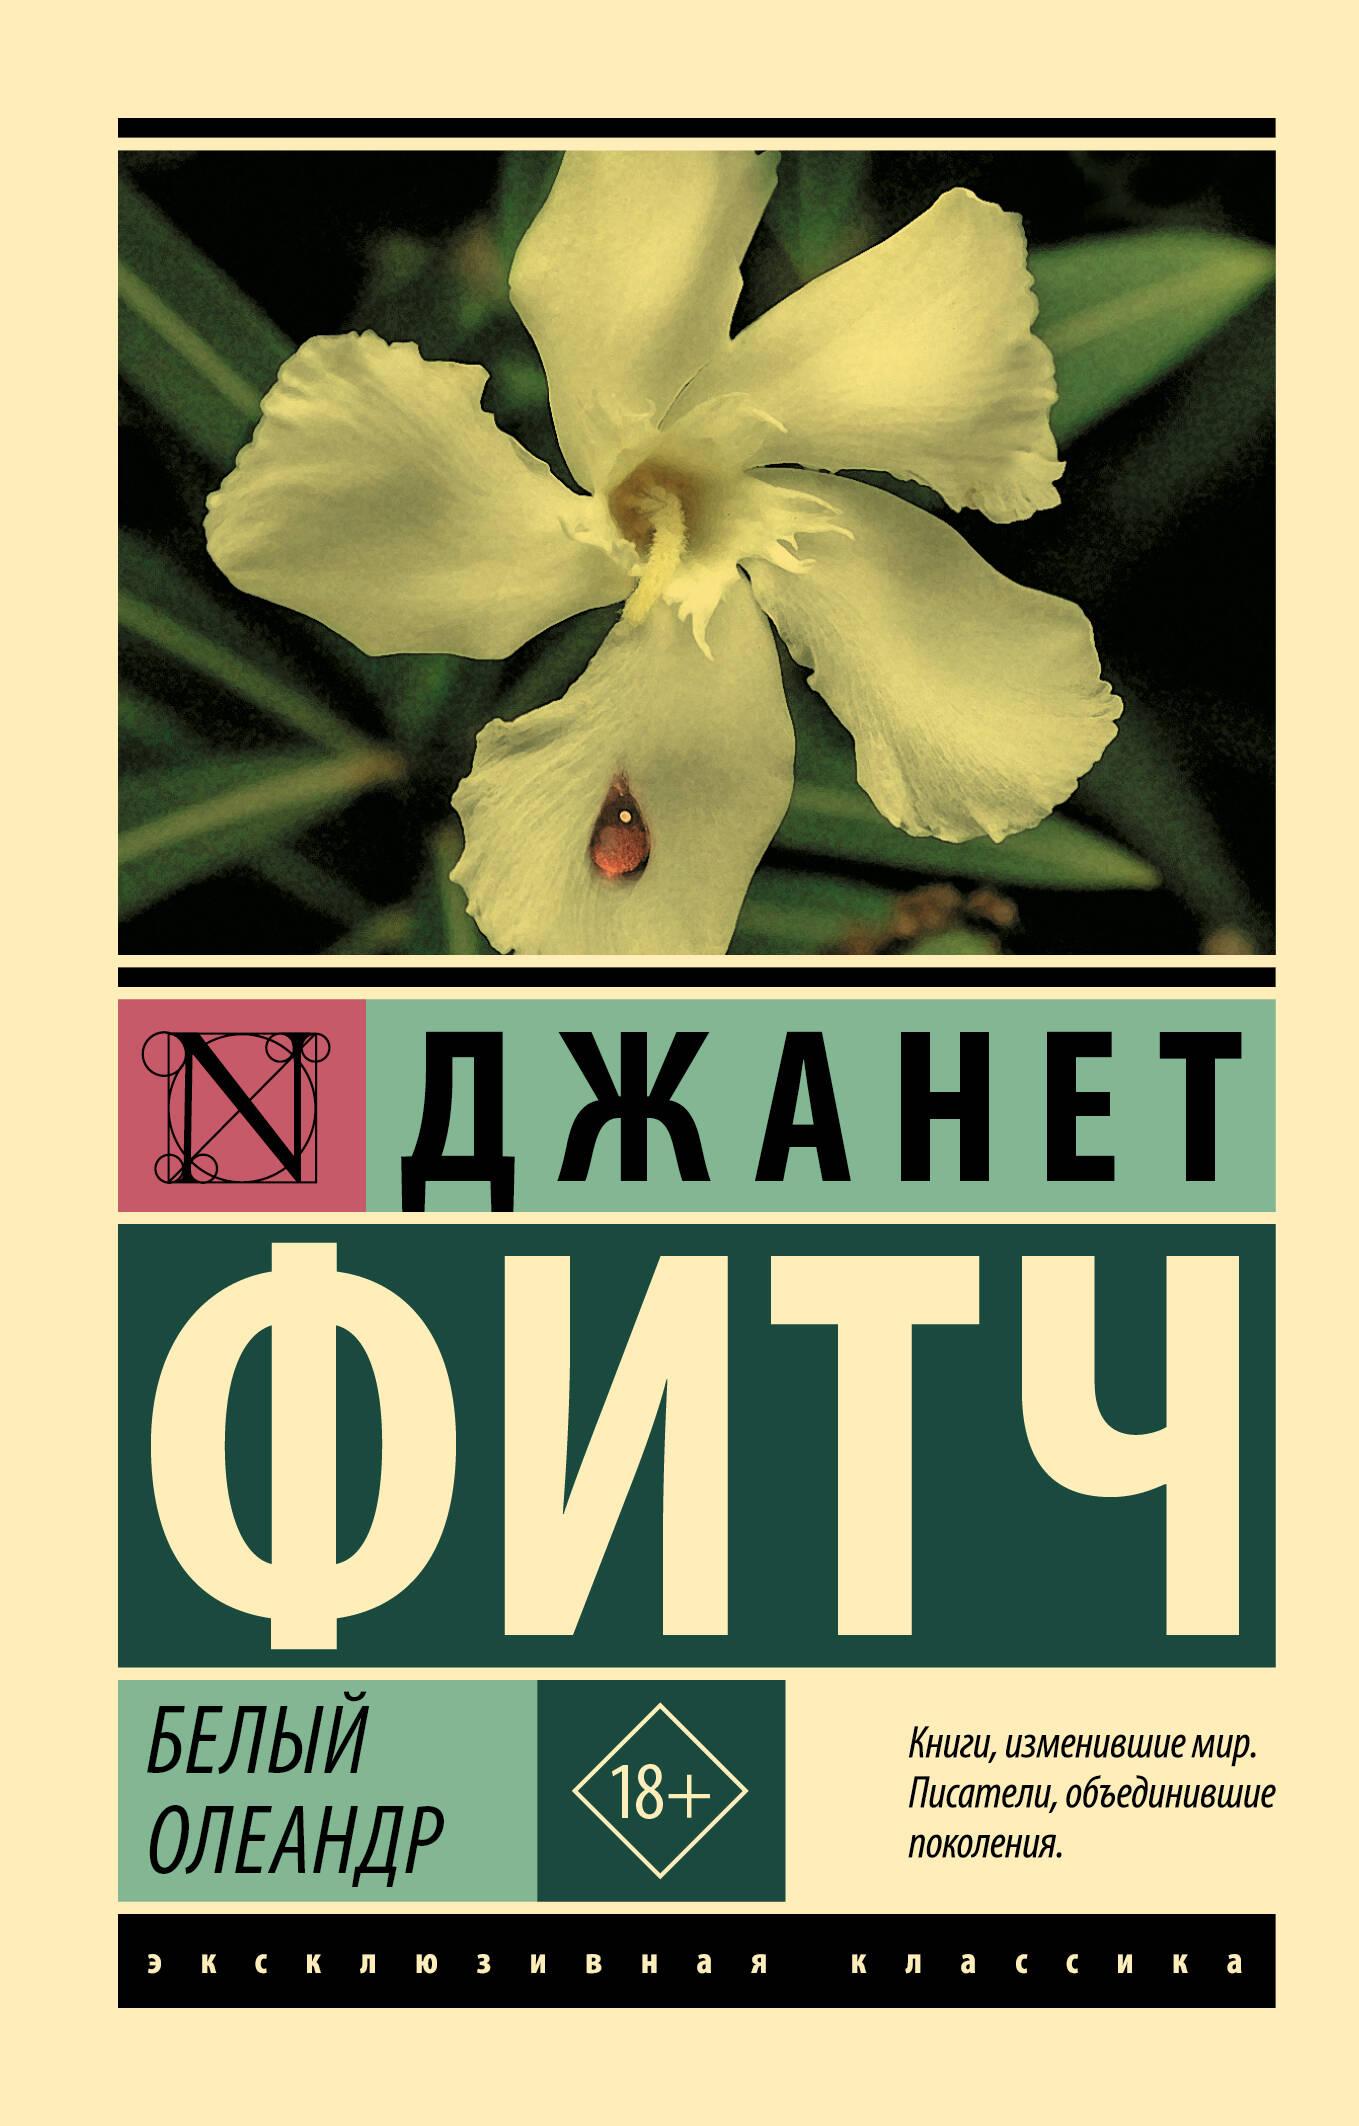 Джанет Фитч Белый олеандр